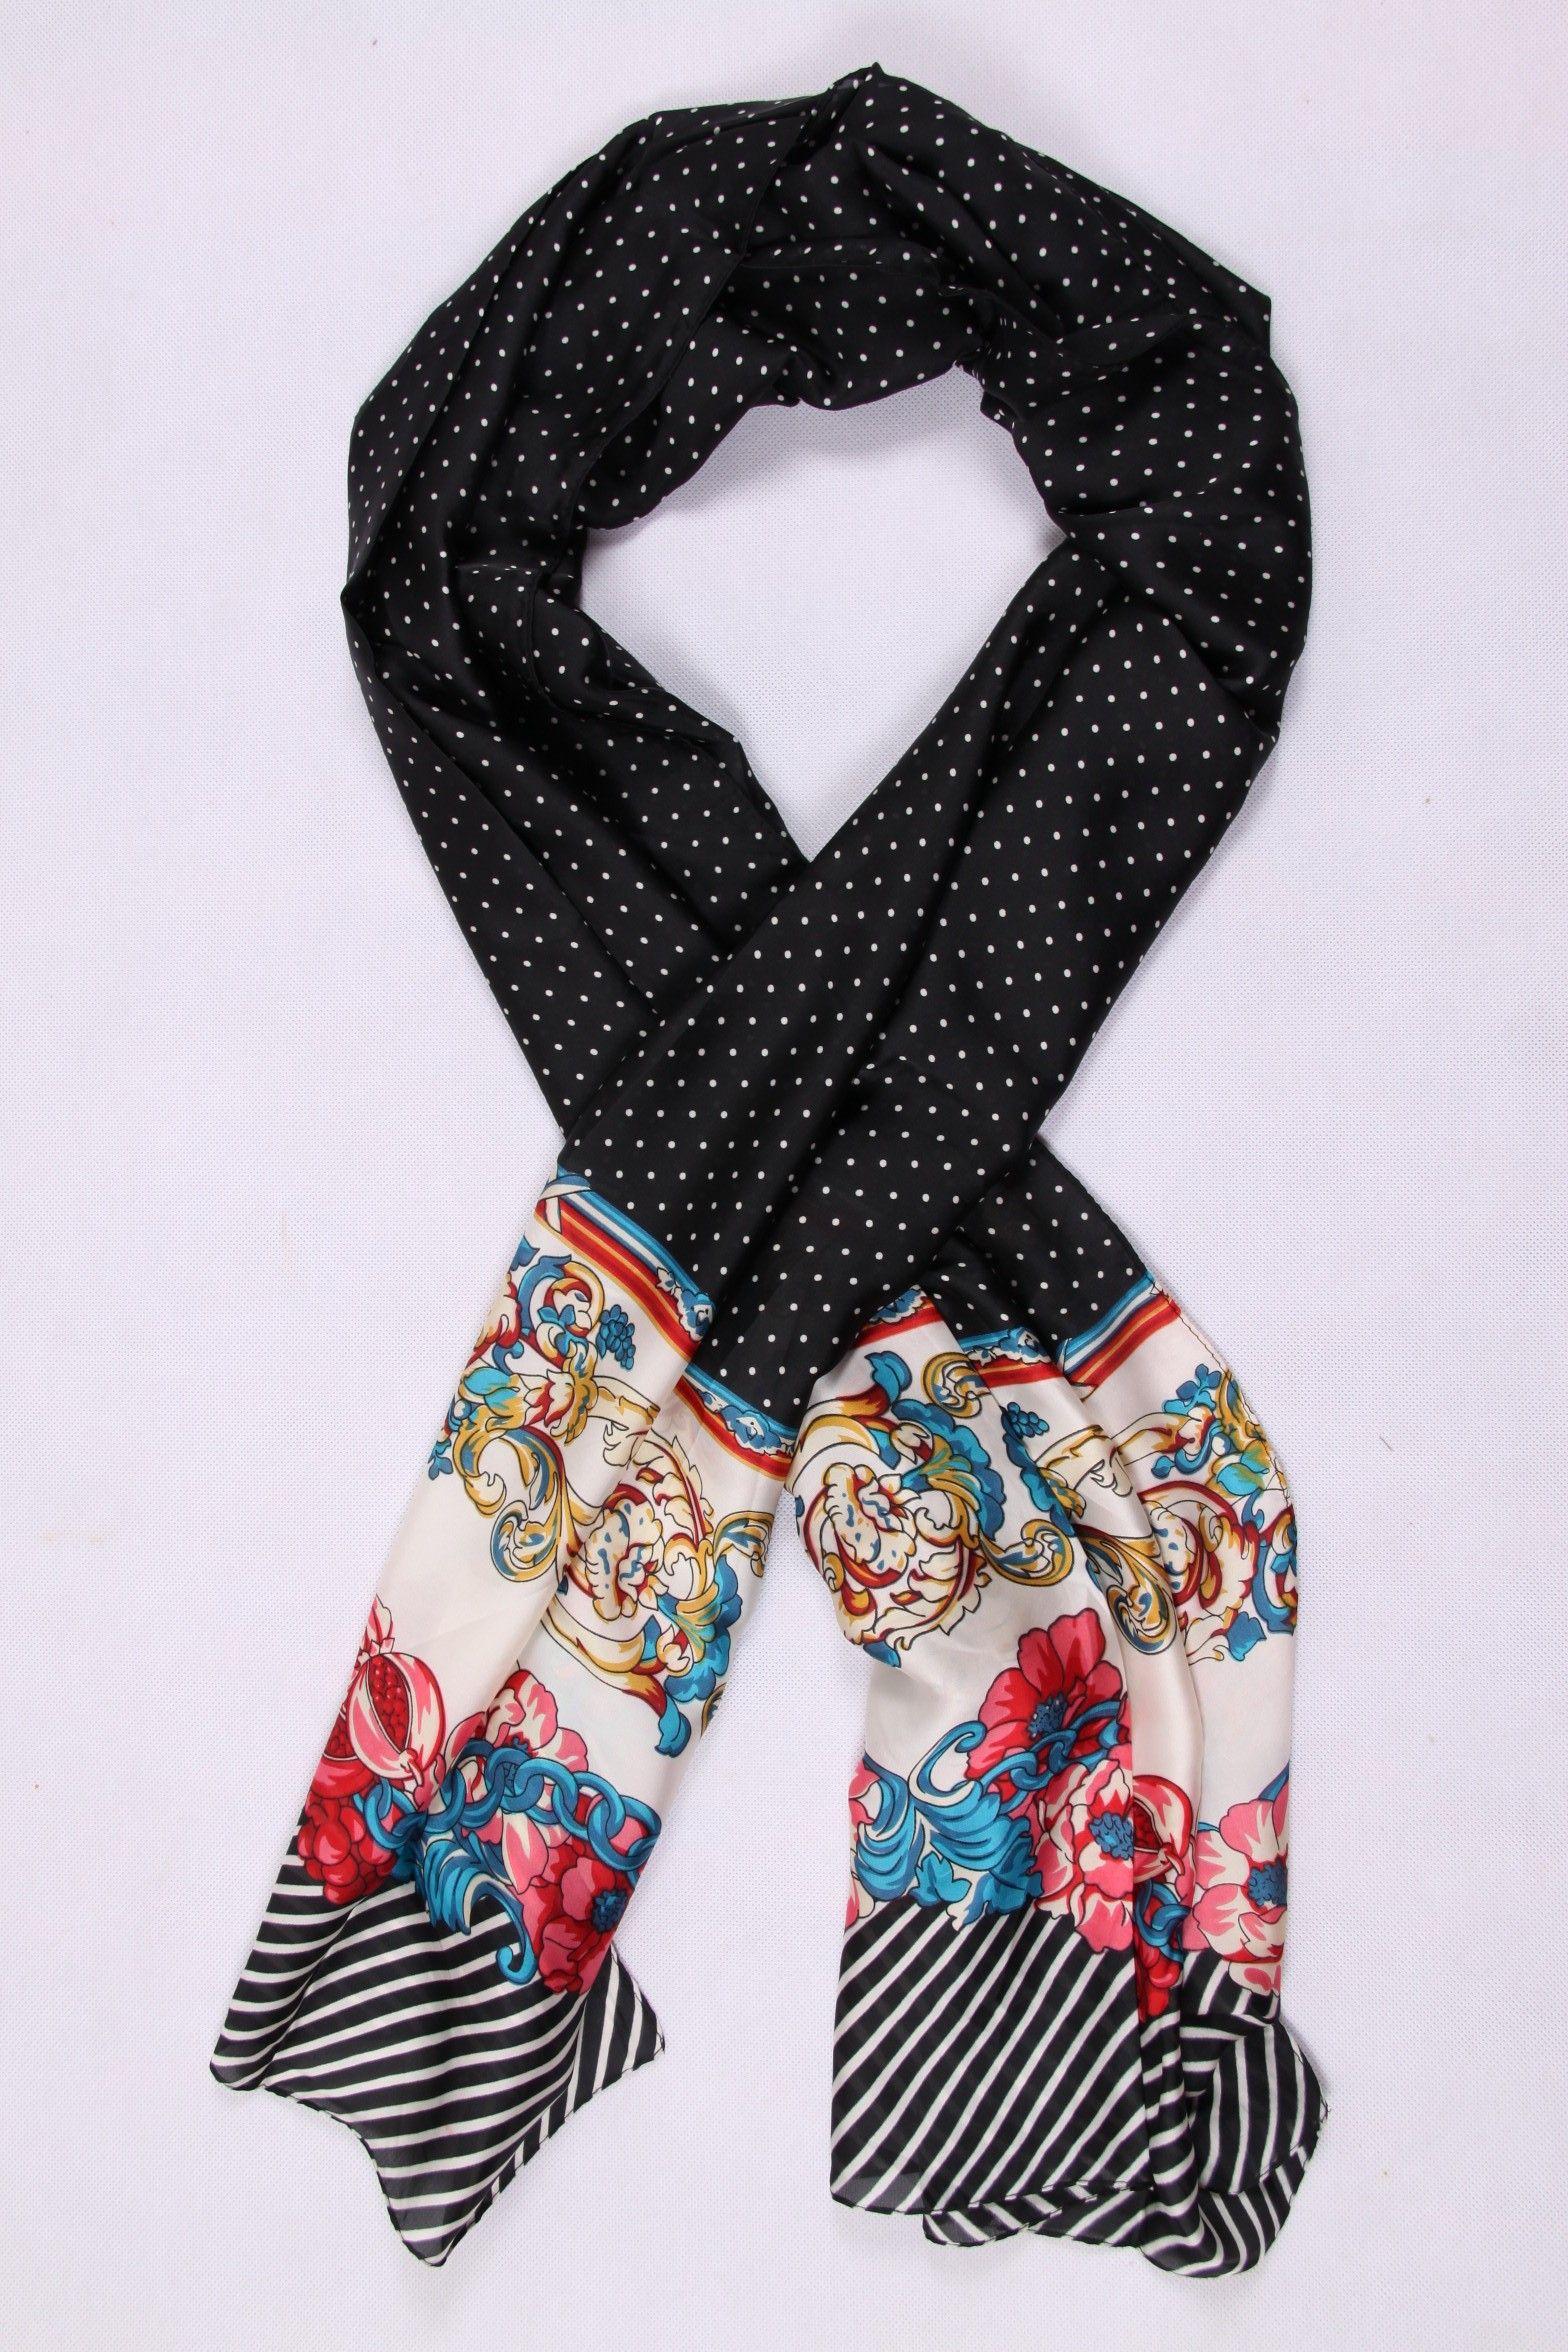 5d86e903e2 Foulard en soie noir avec des pois | Foulard Femme | Foulard ...